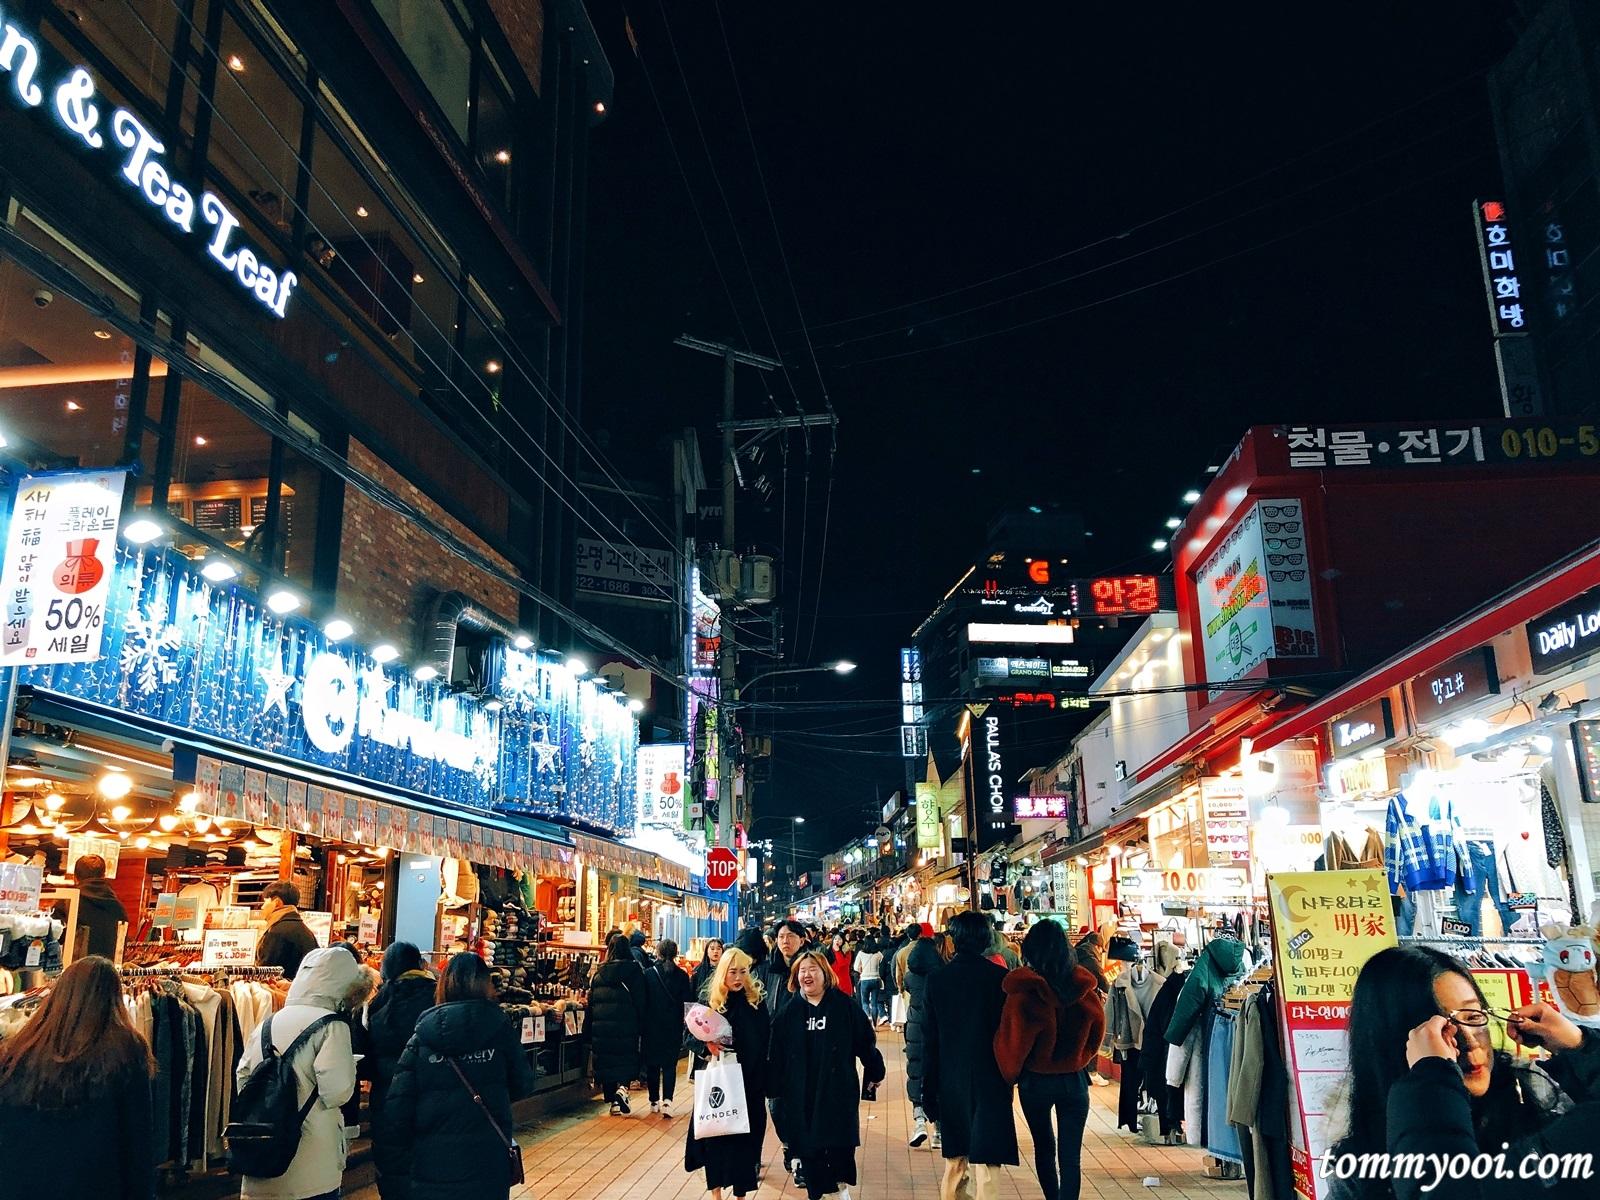 20 Must Visit Seoul Attractions Travel Guide Tommy Ooi 4d3n Bangkok Pattaya Include Nanta Show 9 Hongdae